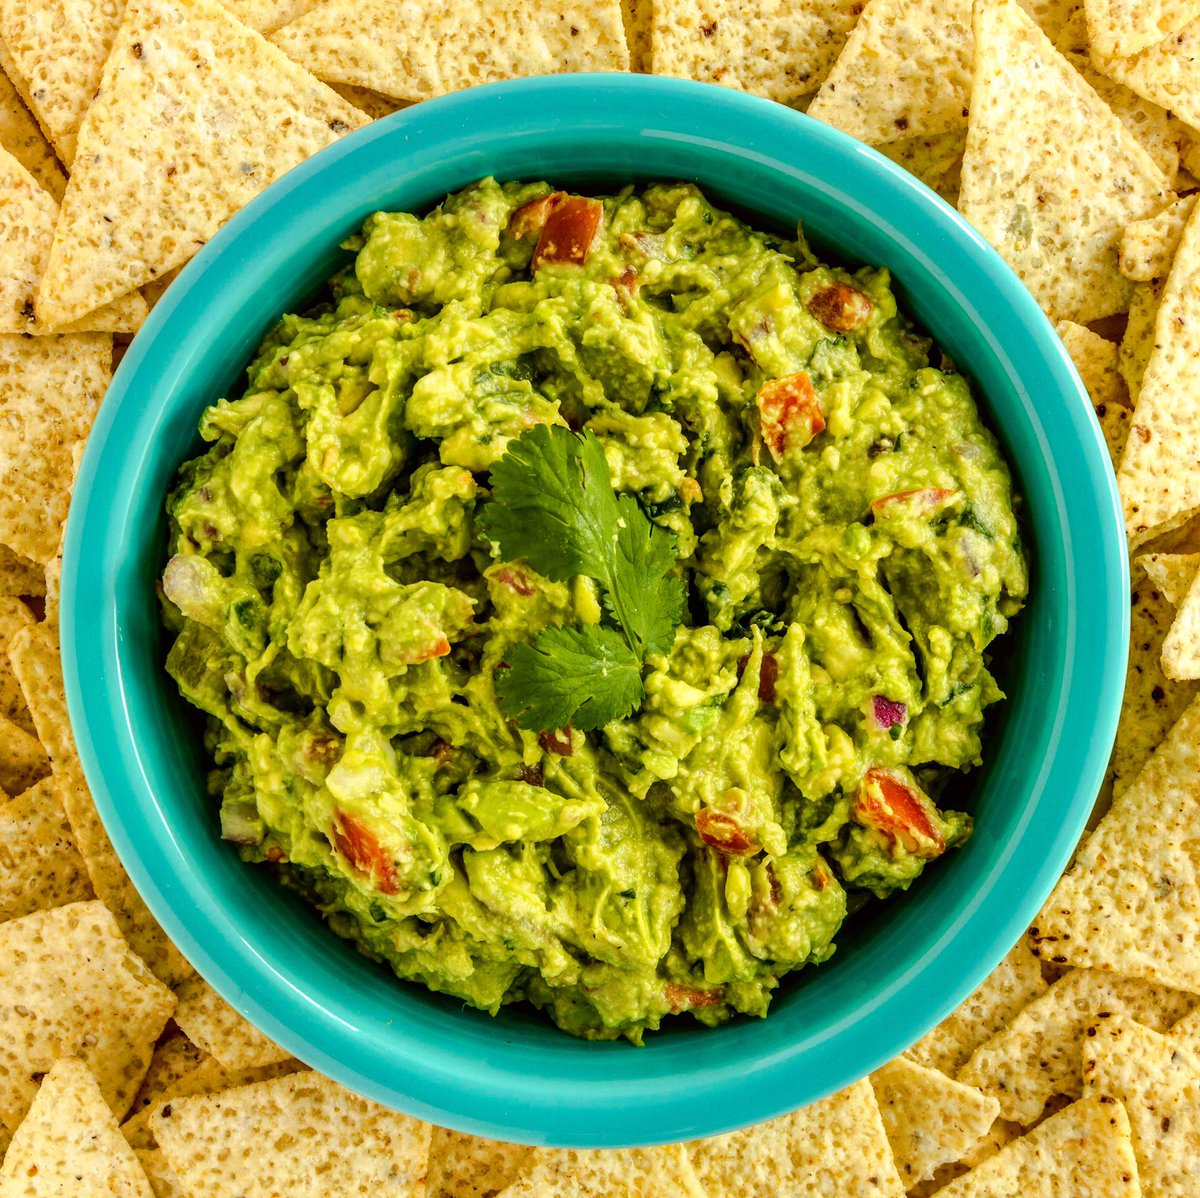 You've guac to be kidding me.  http://www.cashmeresystems.com  #guac #guacamole #guacamole#sustainablepackaging #sustainability #demandplanning #traceability #foodislife #foodisbae #mexicanfood #snacks #tortillachips #vegan #vegansnacks #snacks #snacktime #snackboxpic.twitter.com/2d140XVusH